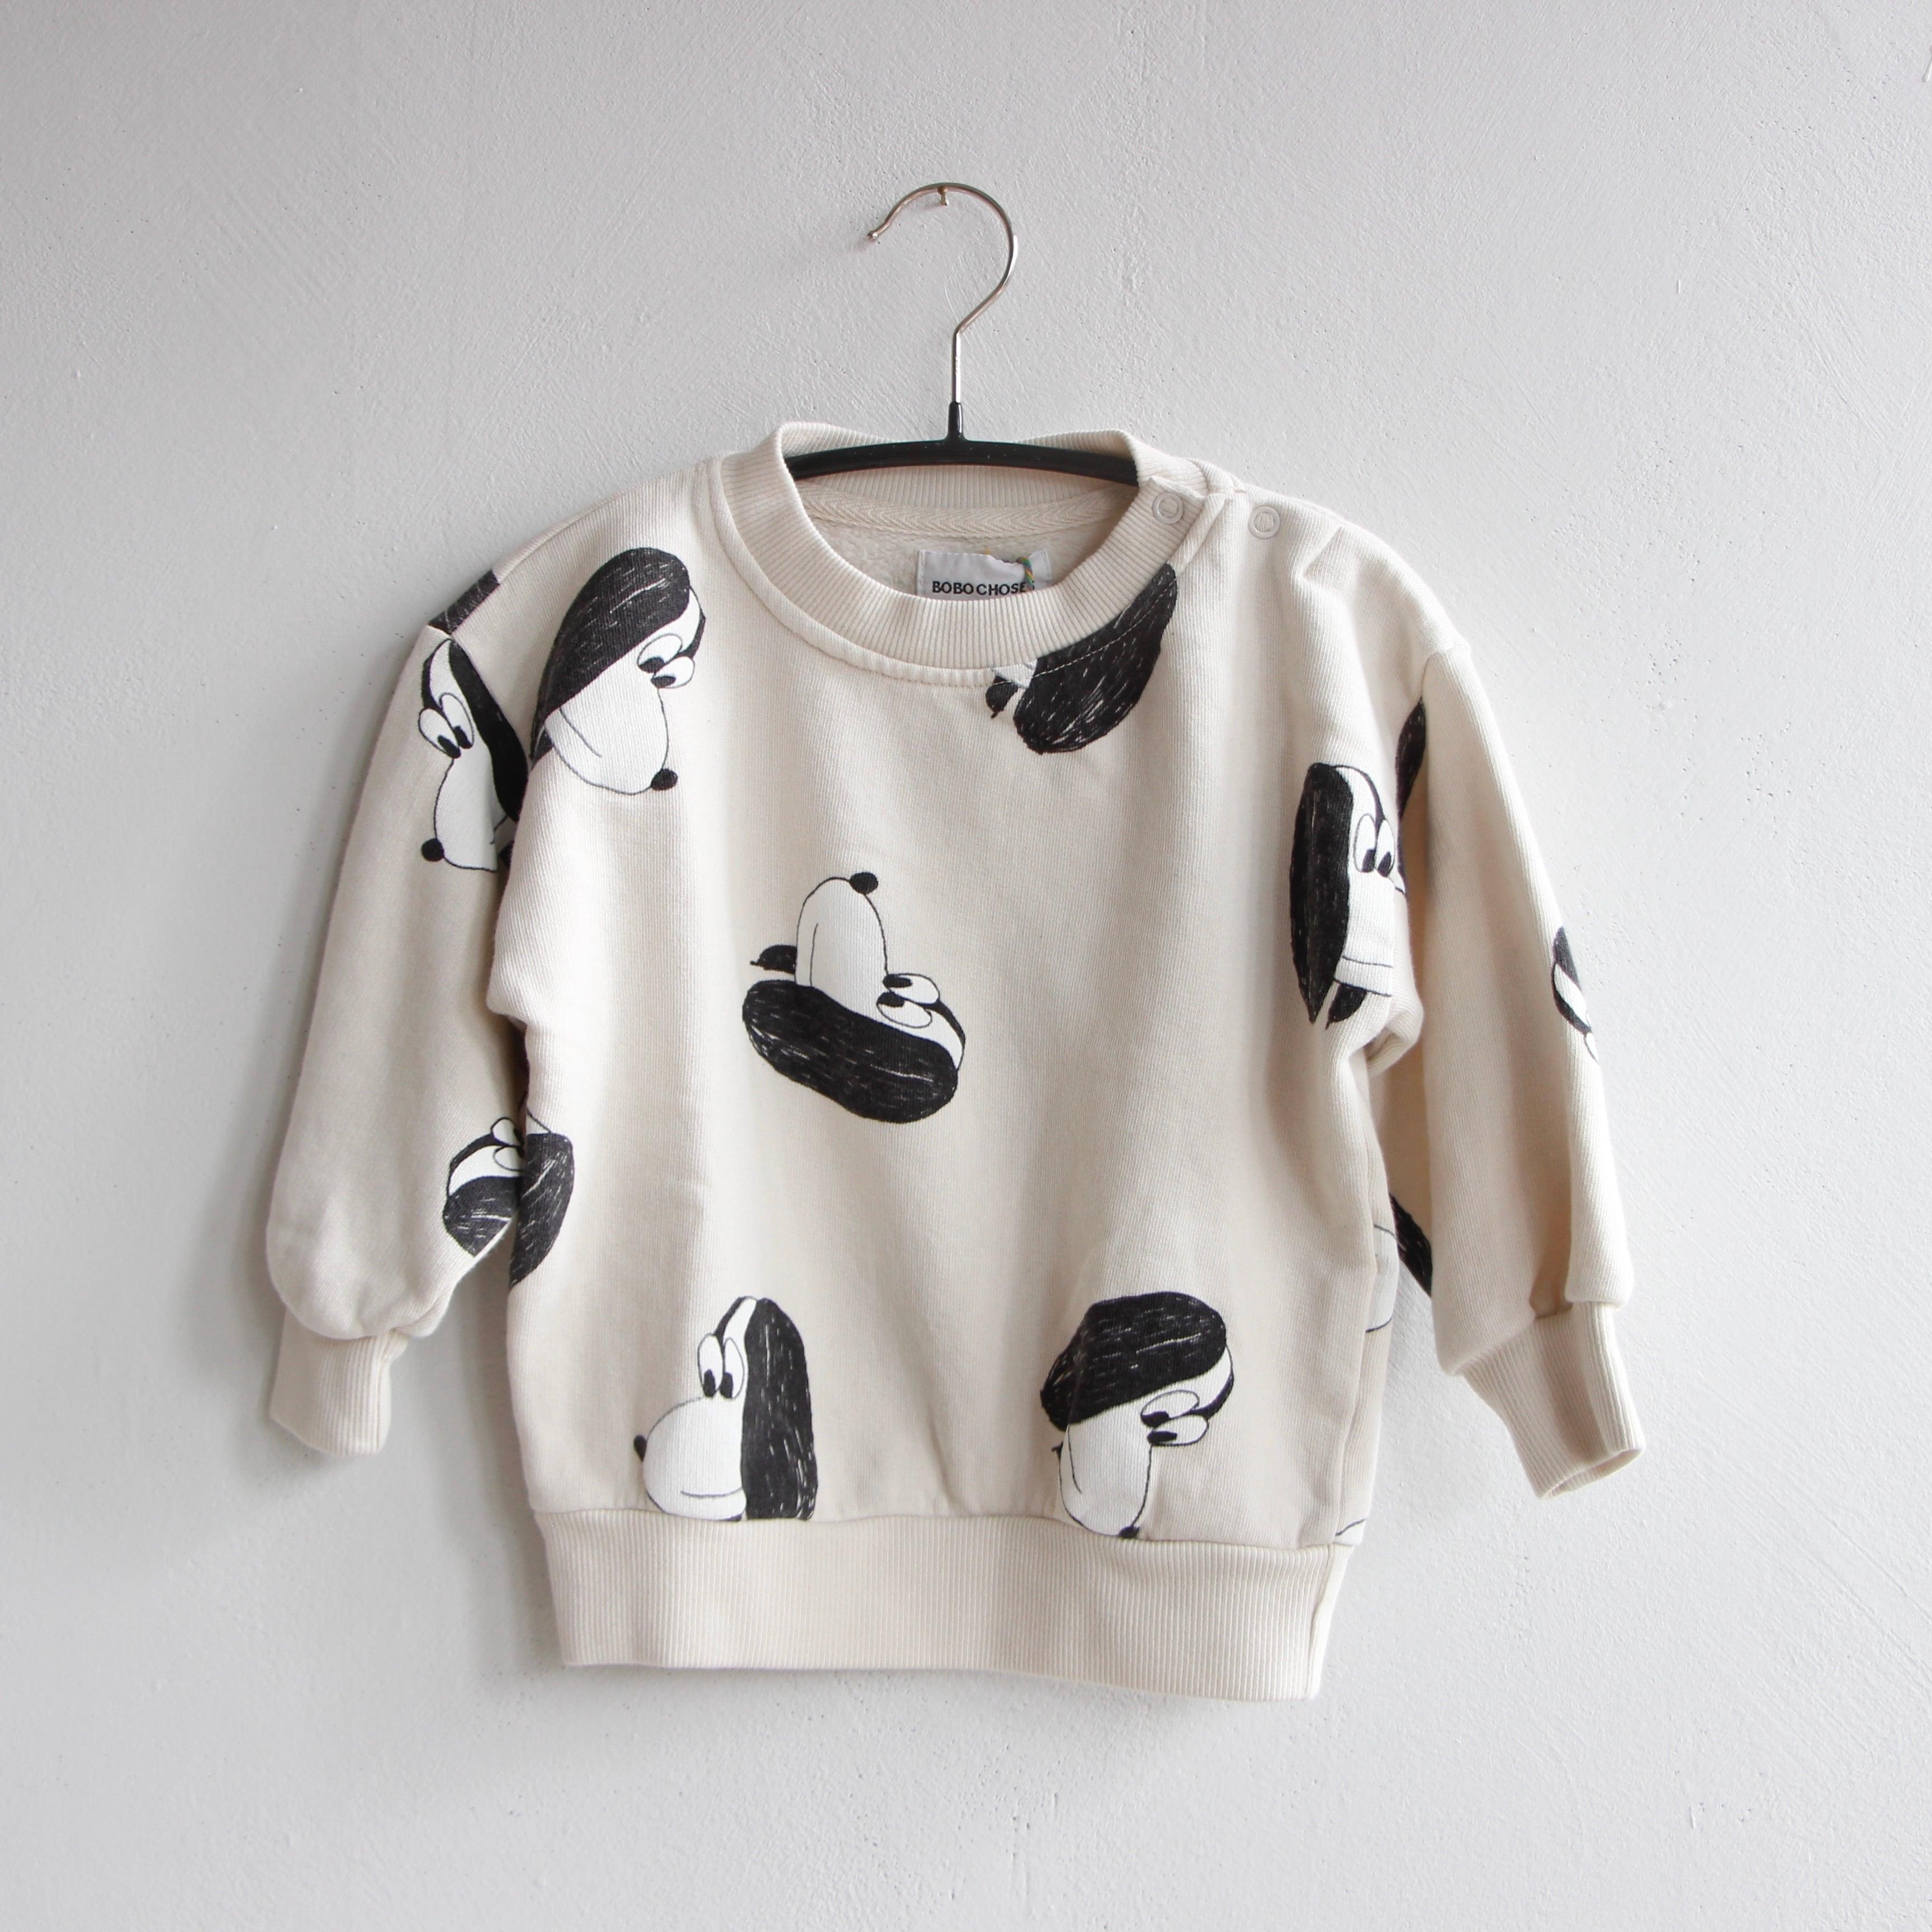 《BOBO CHOSES 2021AW》Doggie All Over sweatshirt / 12-36M